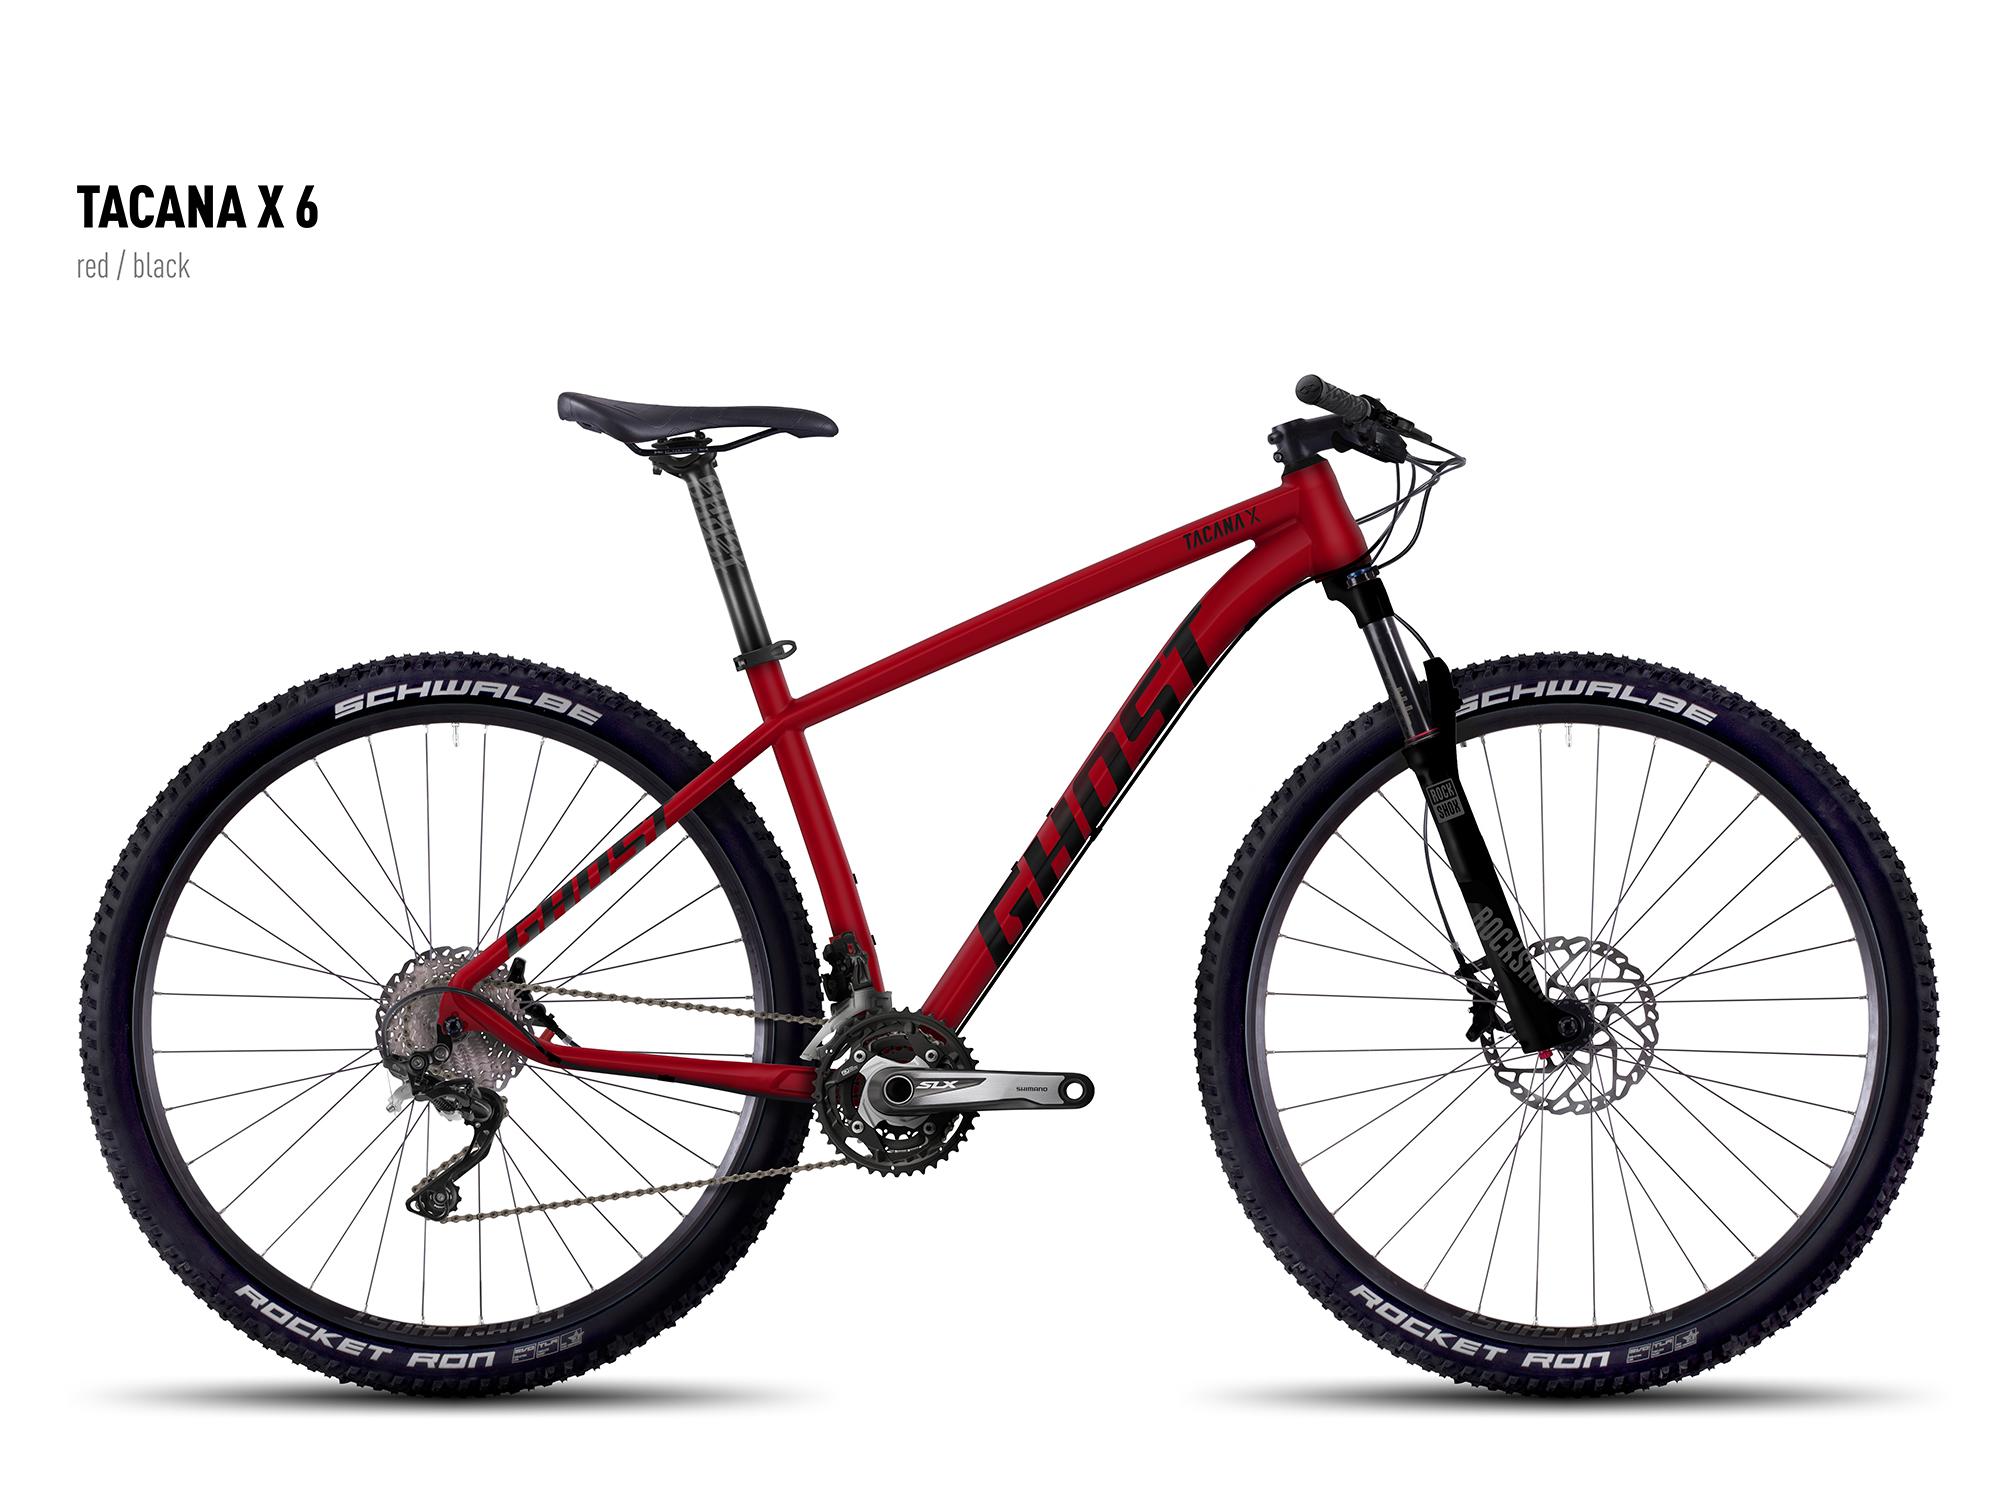 "GHOST Tacana X 6 red/black XS / 38cm / 15"" , 2016"